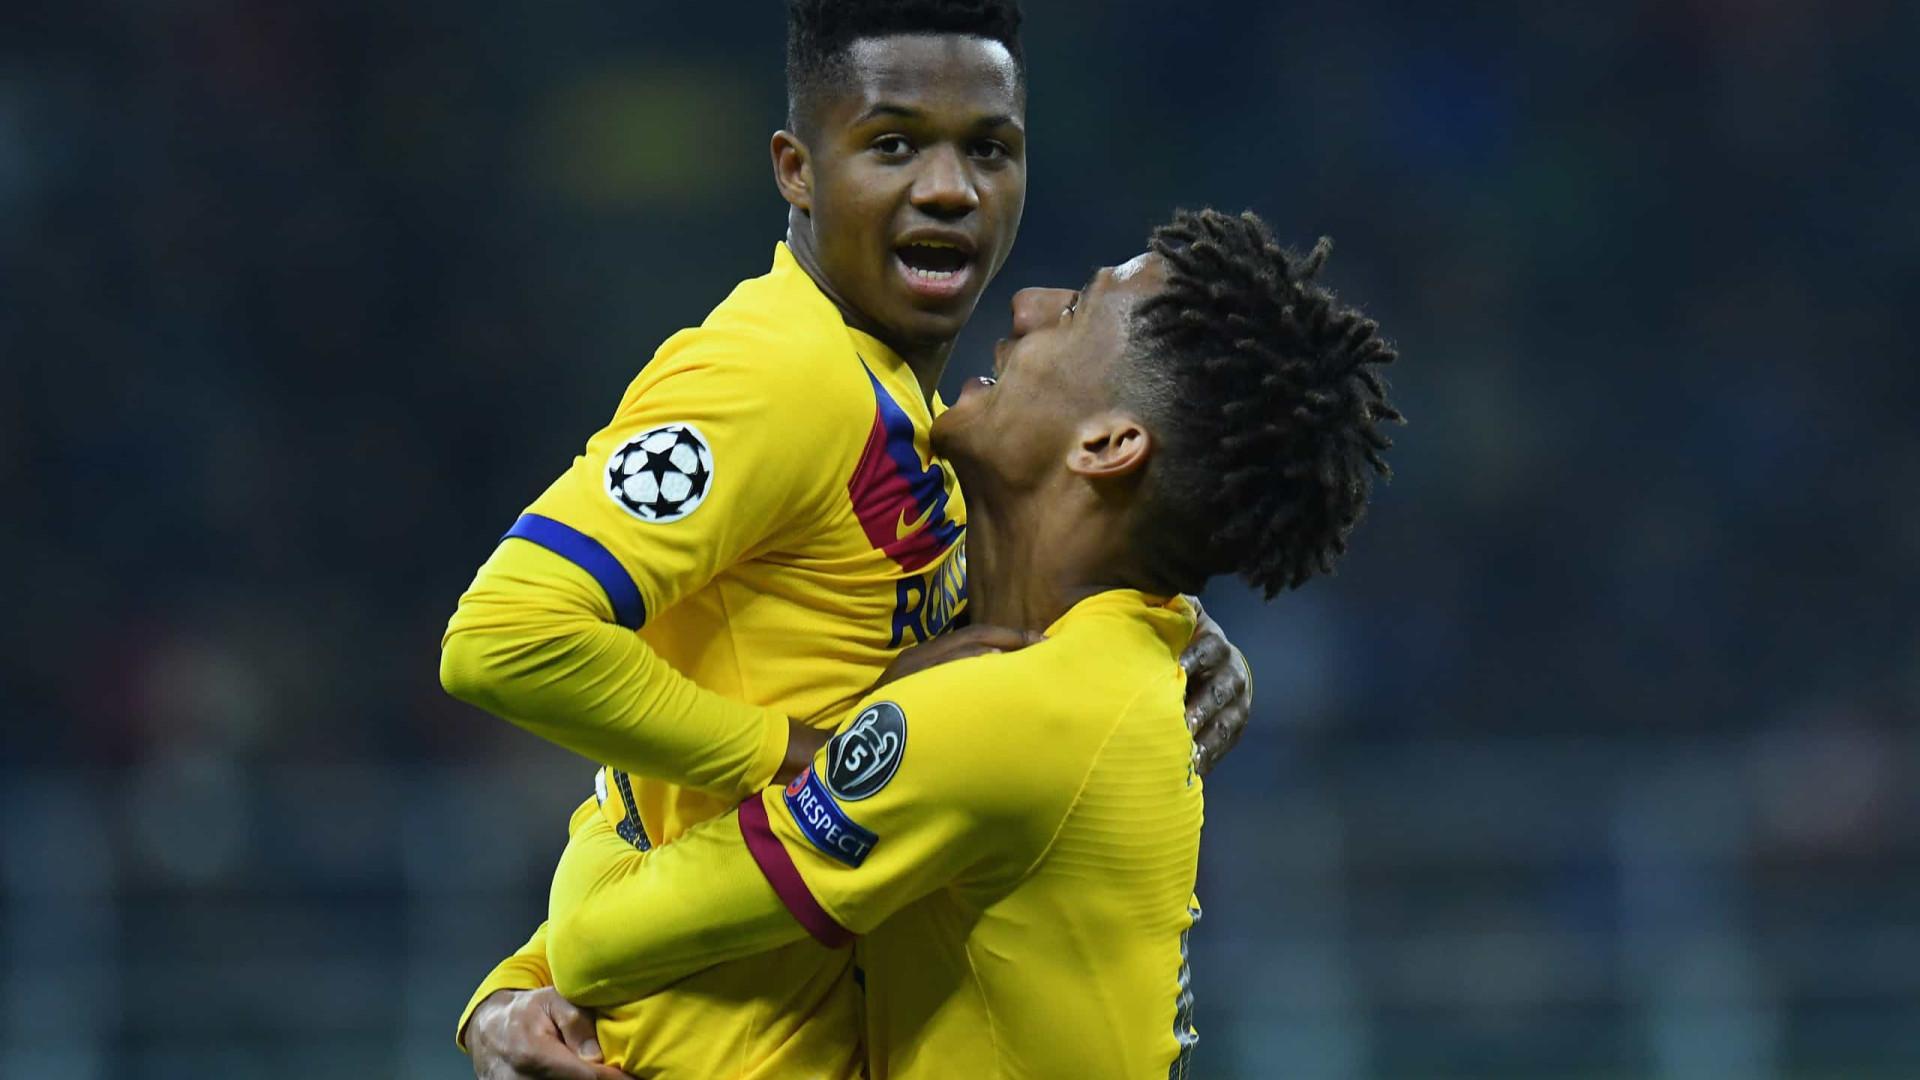 Ansu Fati torna-se no mais jovem de sempre a marcar na Champions